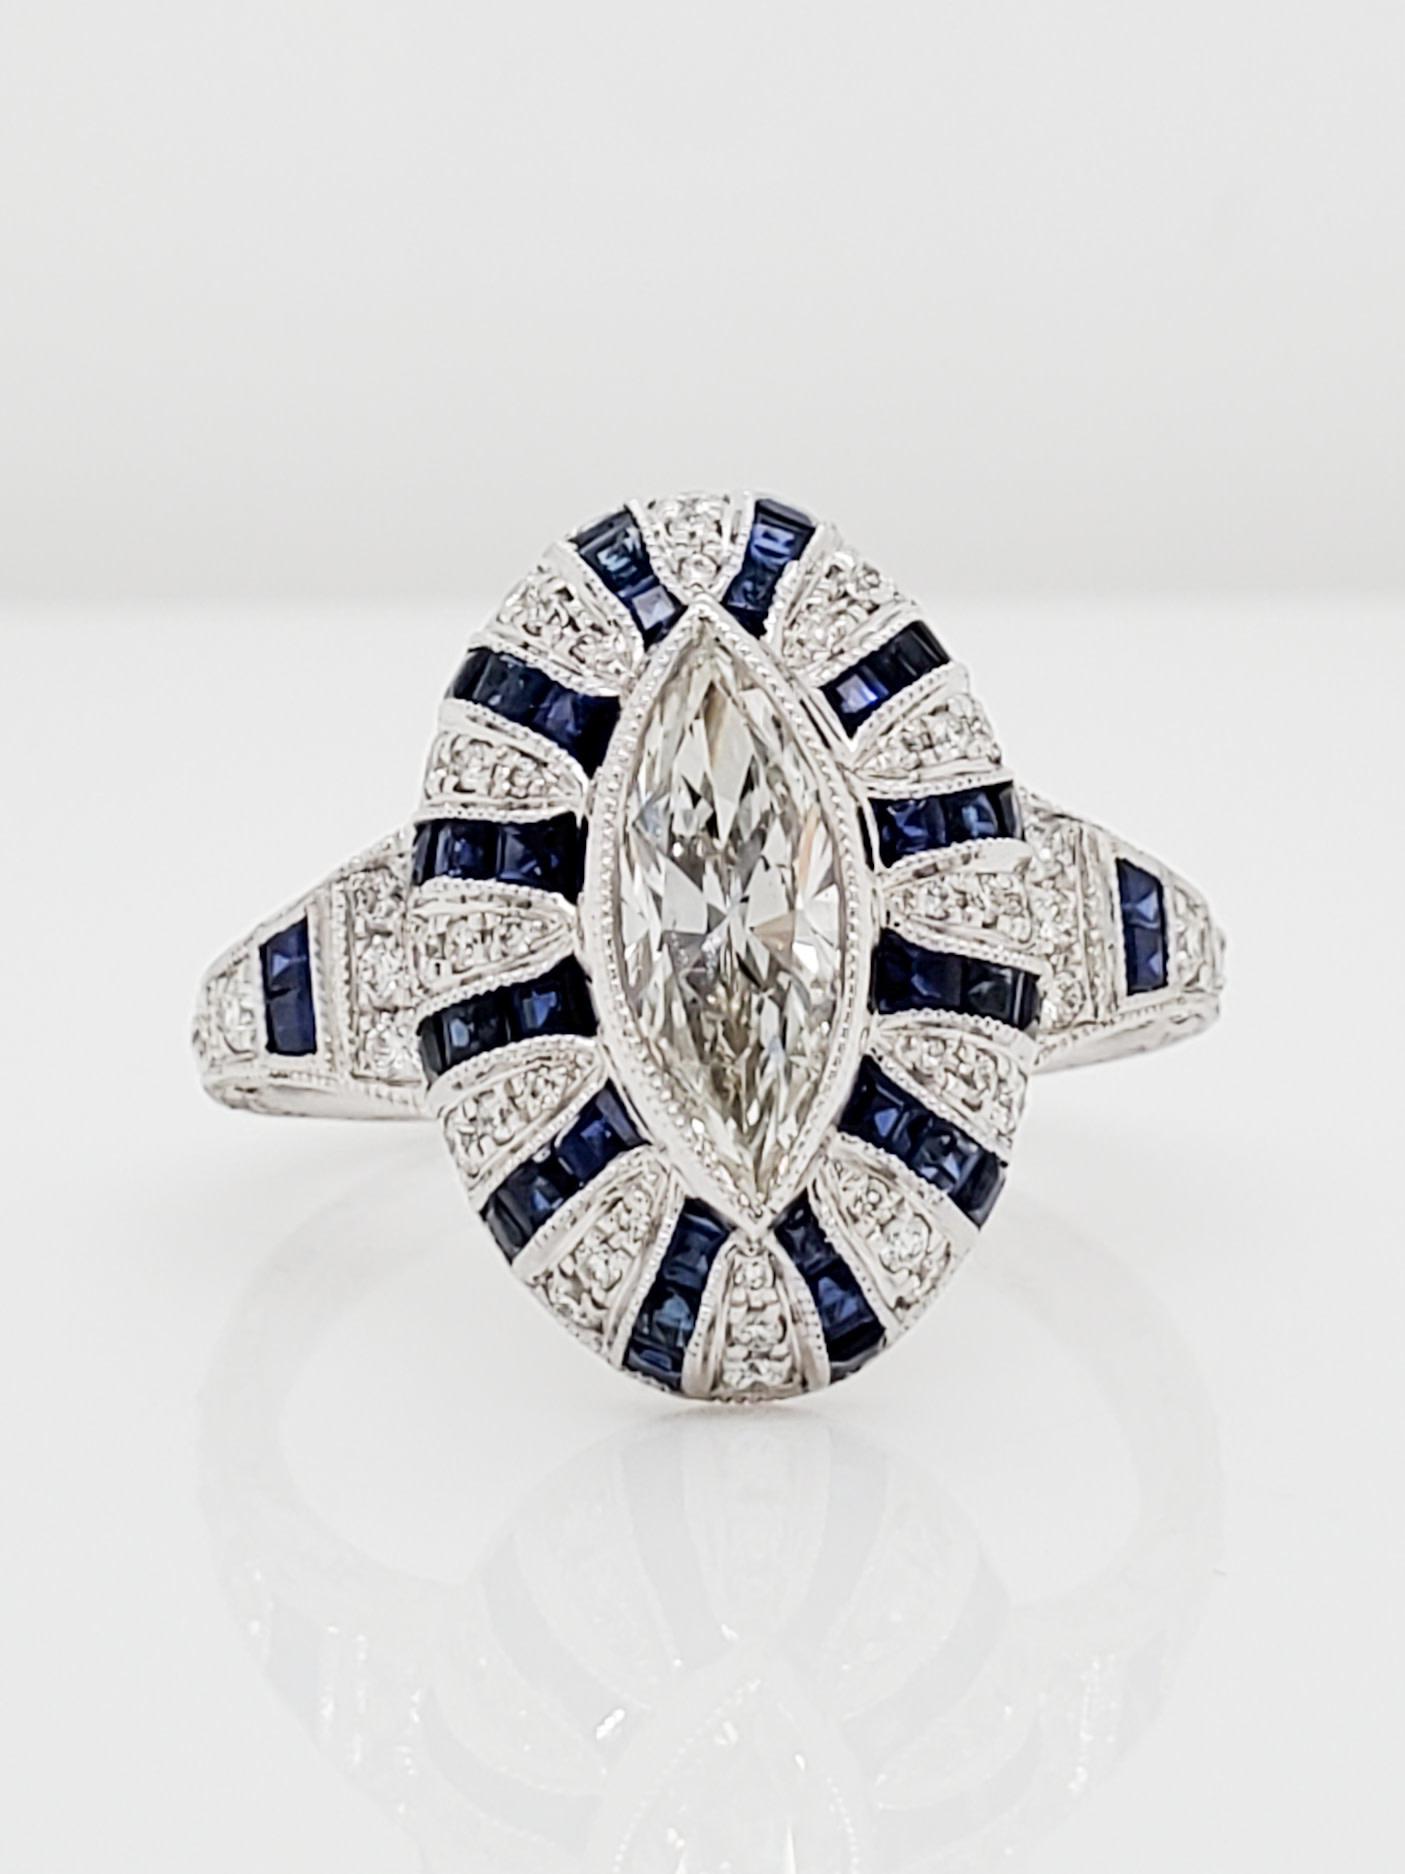 14KT White Gold Vintage 0.97 CT Marquis Diamond & Sapphire Ring